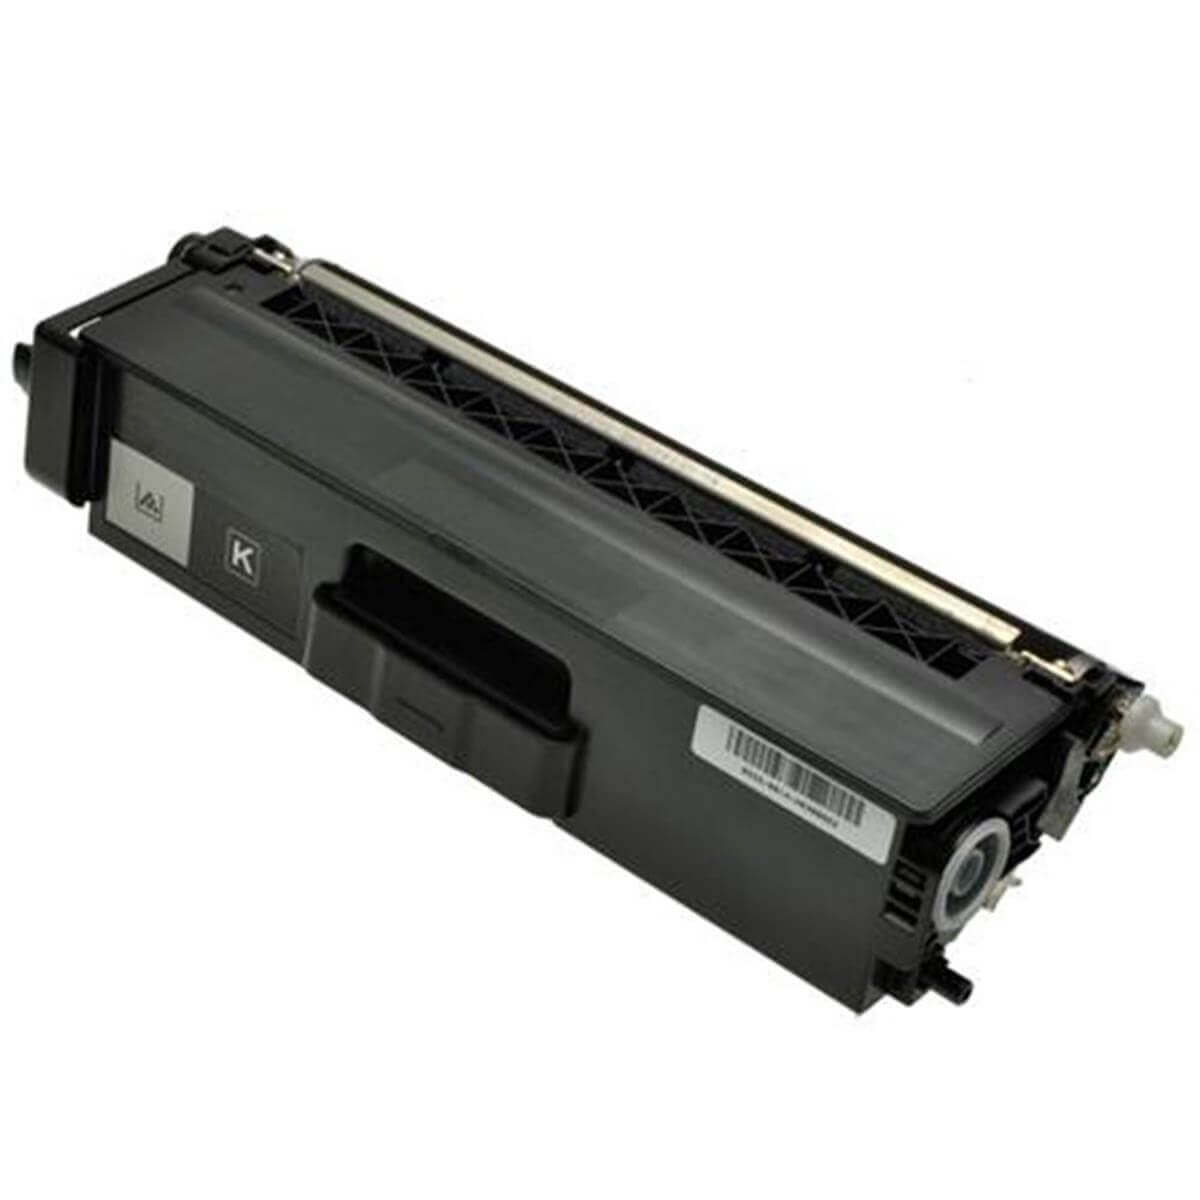 Toner Compatível Lotus TN319 Black p/ Brother - 6k